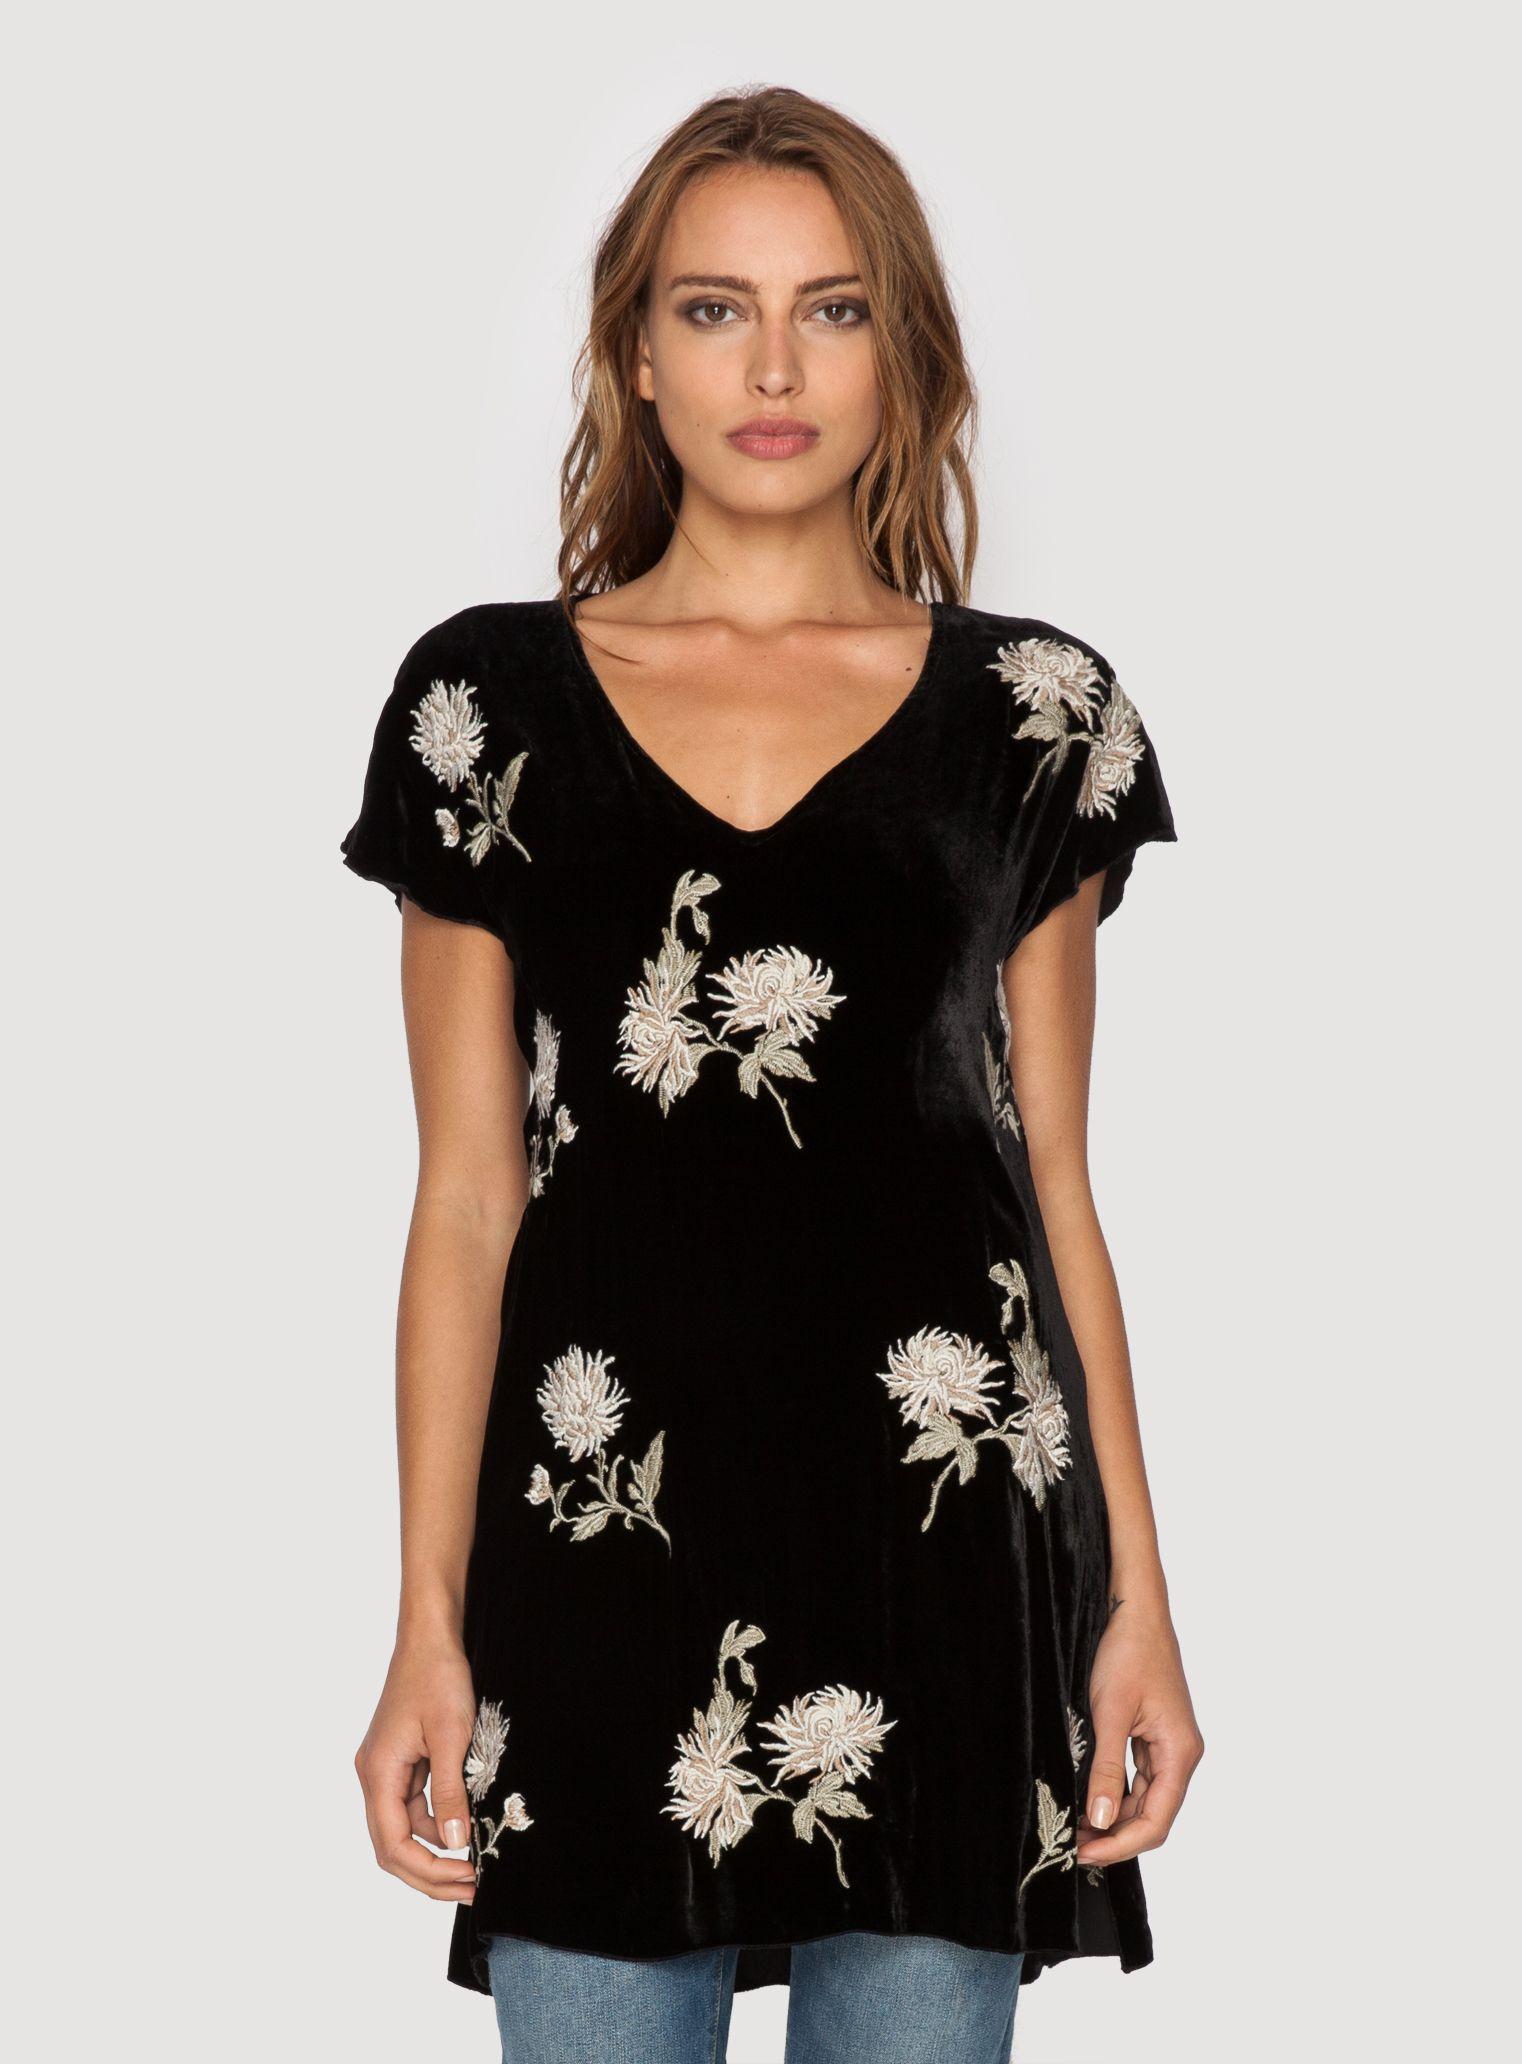 Johnny Was Clothing JWLA embroidered velvet MARGARIT ASYMMETRICAL DRESS in Black